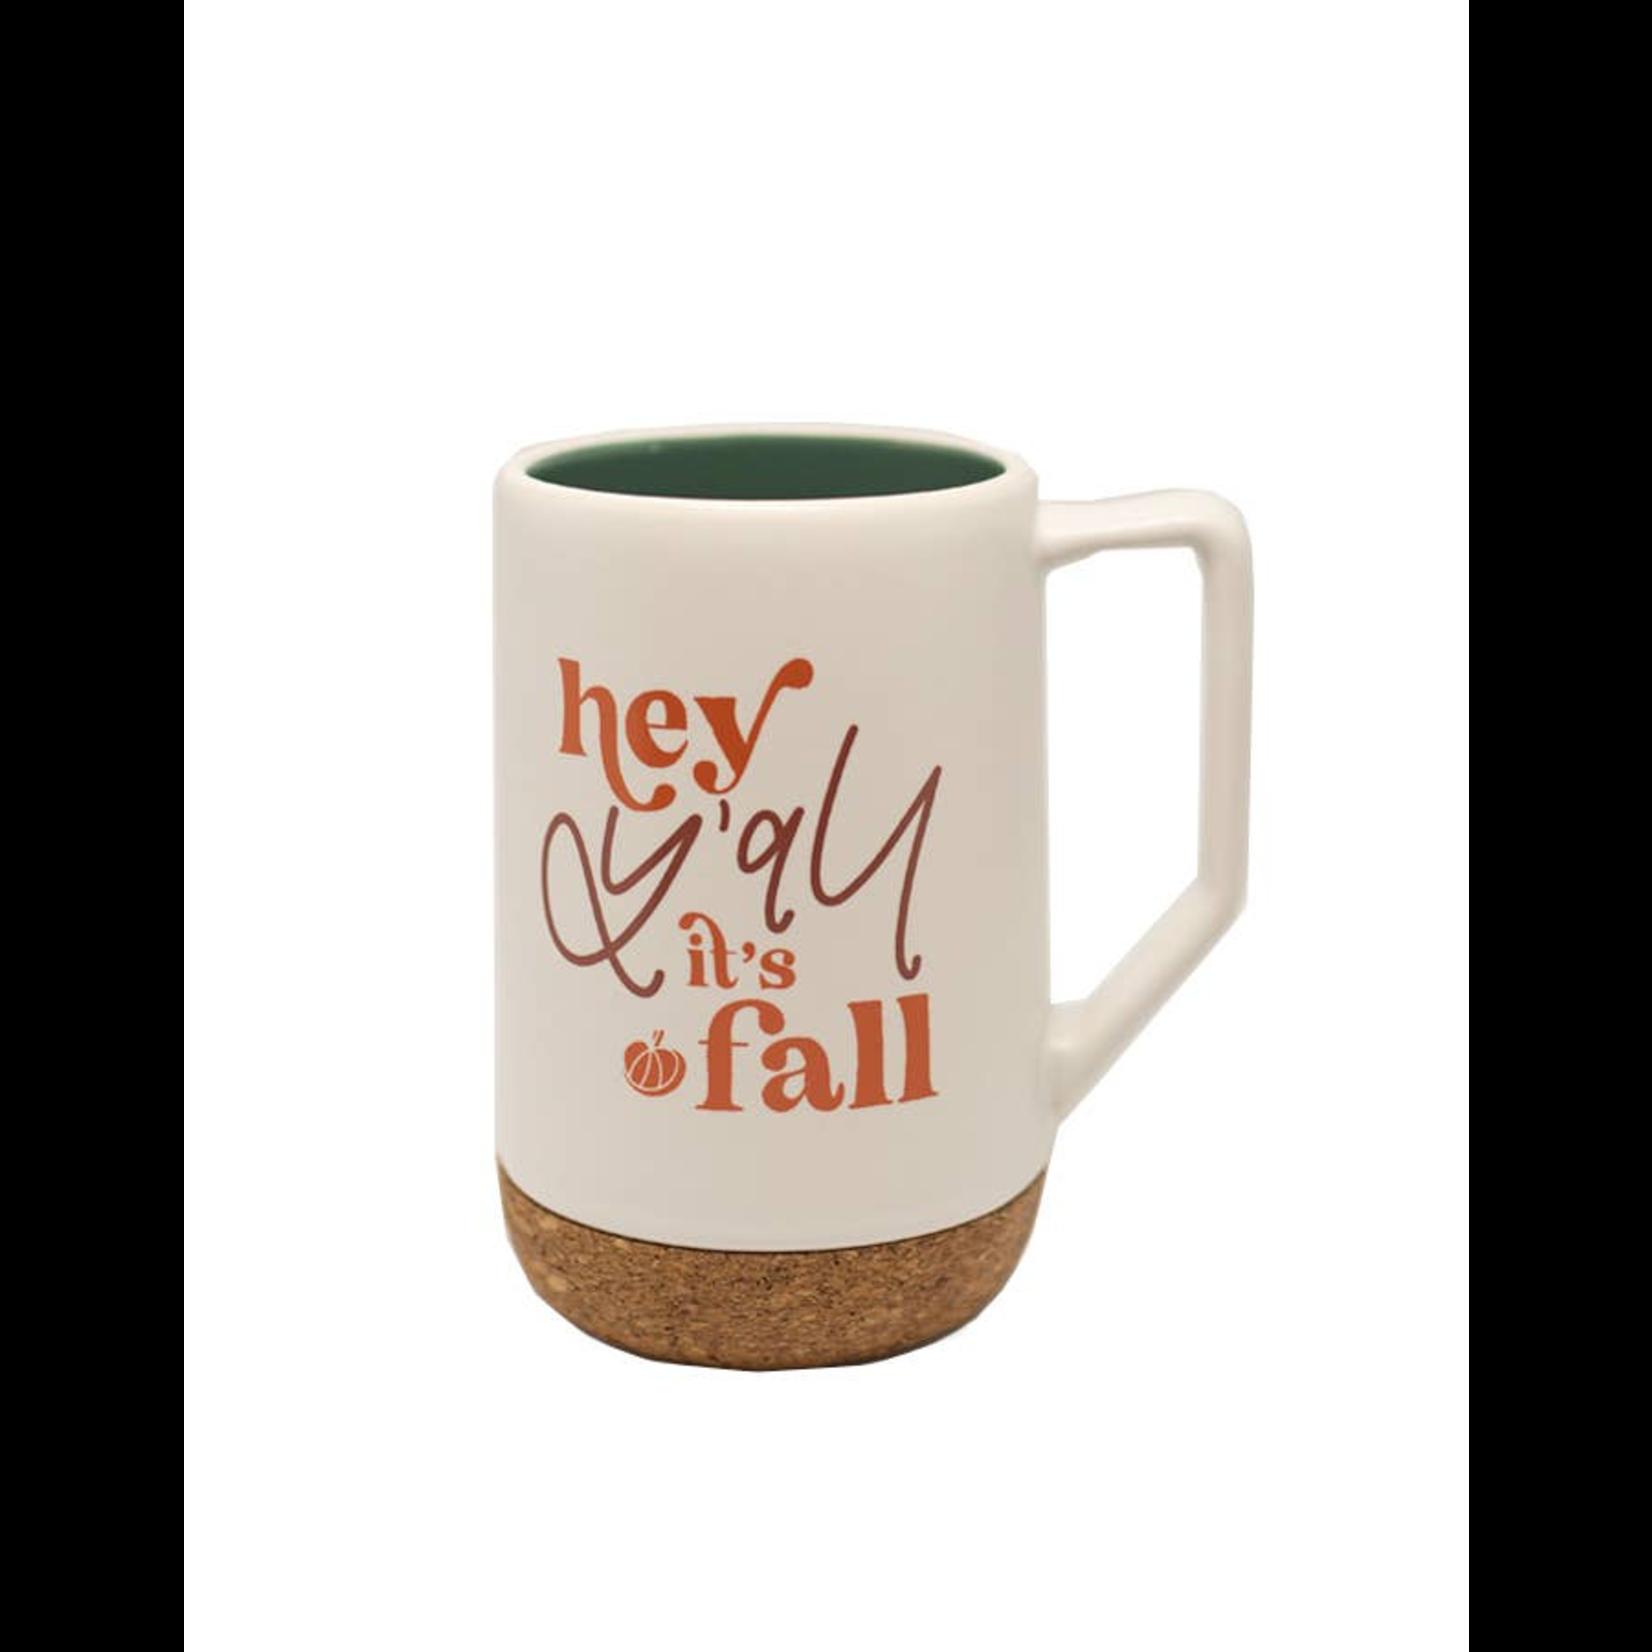 Chalkfulloflove Fall Y'all mug